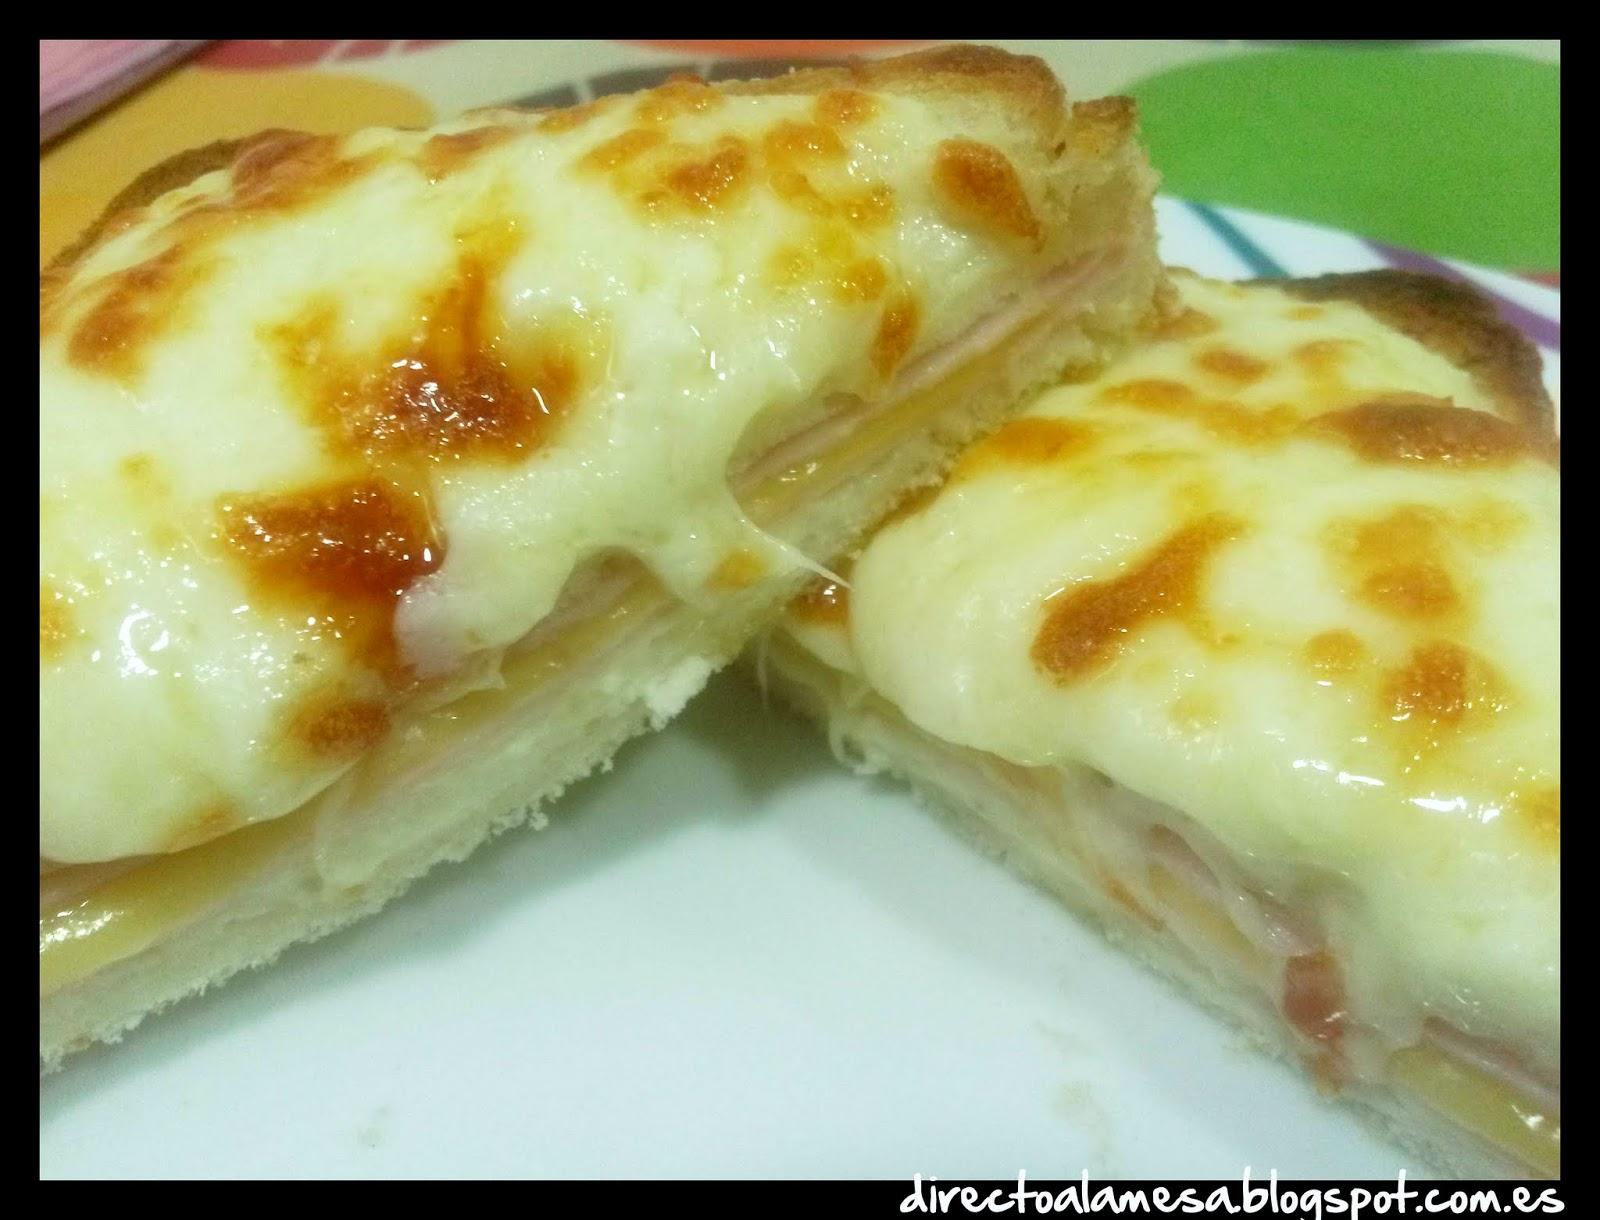 http://directoalamesa.blogspot.com.es/2014/10/sandwich-croque-monsieur.html